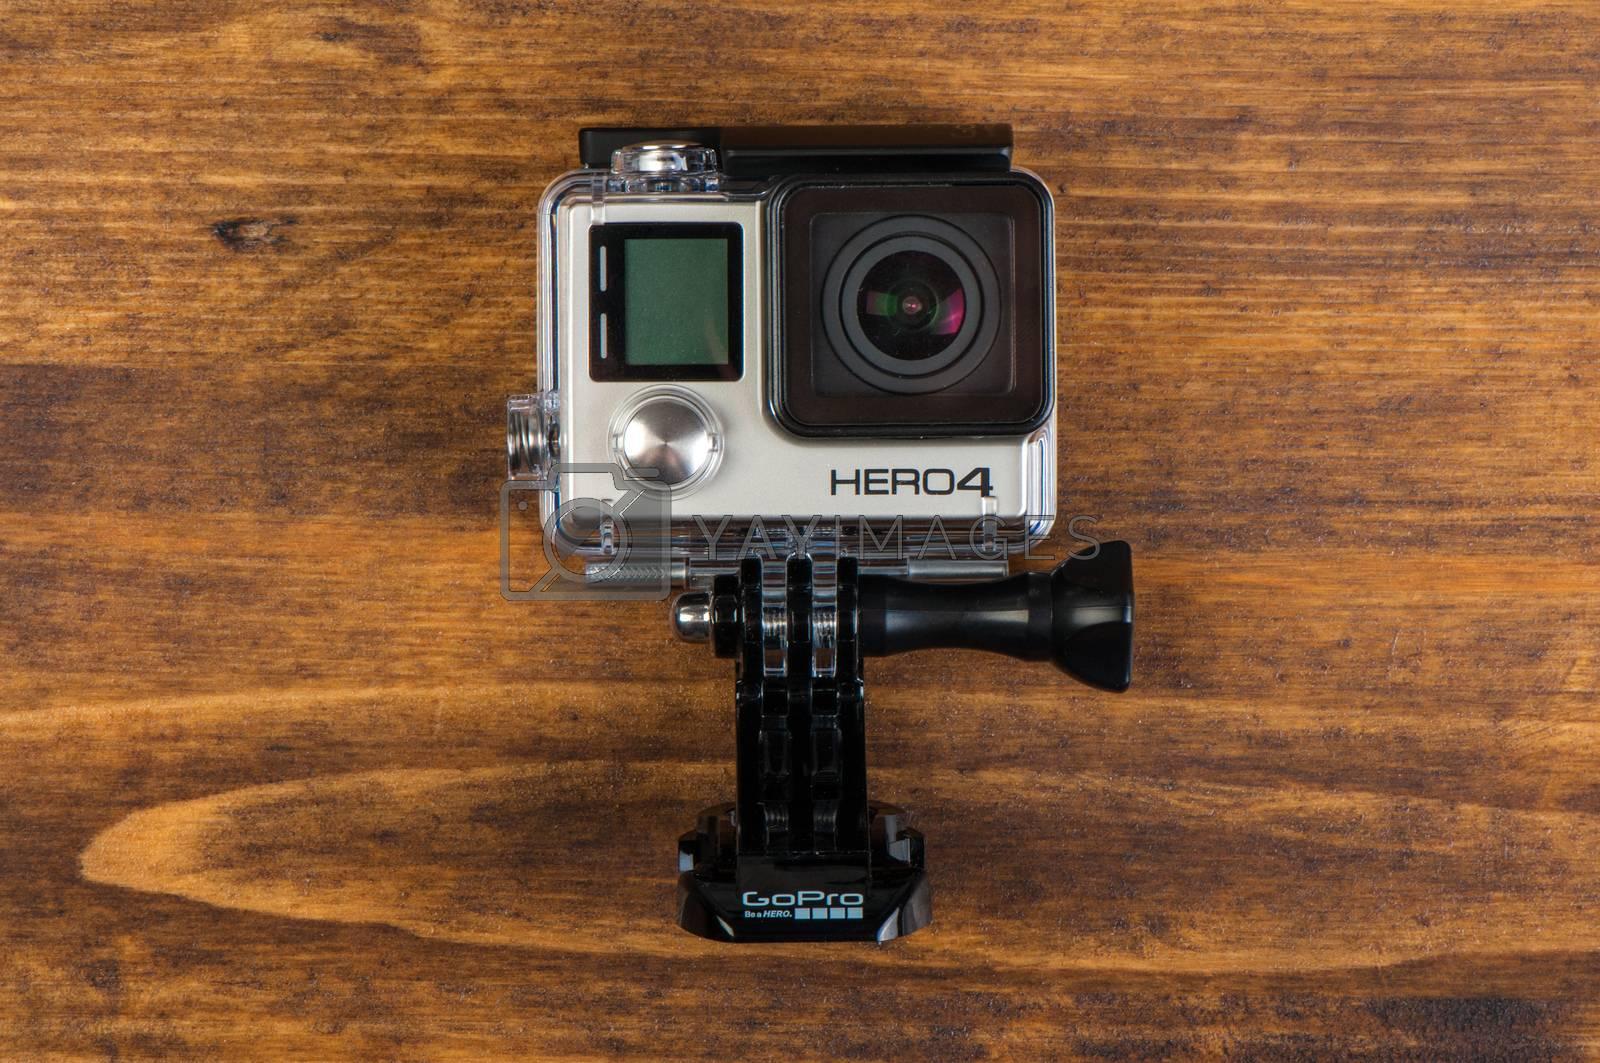 NOVI SAD, SERBIA - JUNE 19, 2016: GoPro Hero 4 Black waterproof action camera announced in september 2014 captures up to 30 photos per second, illustrative editorial